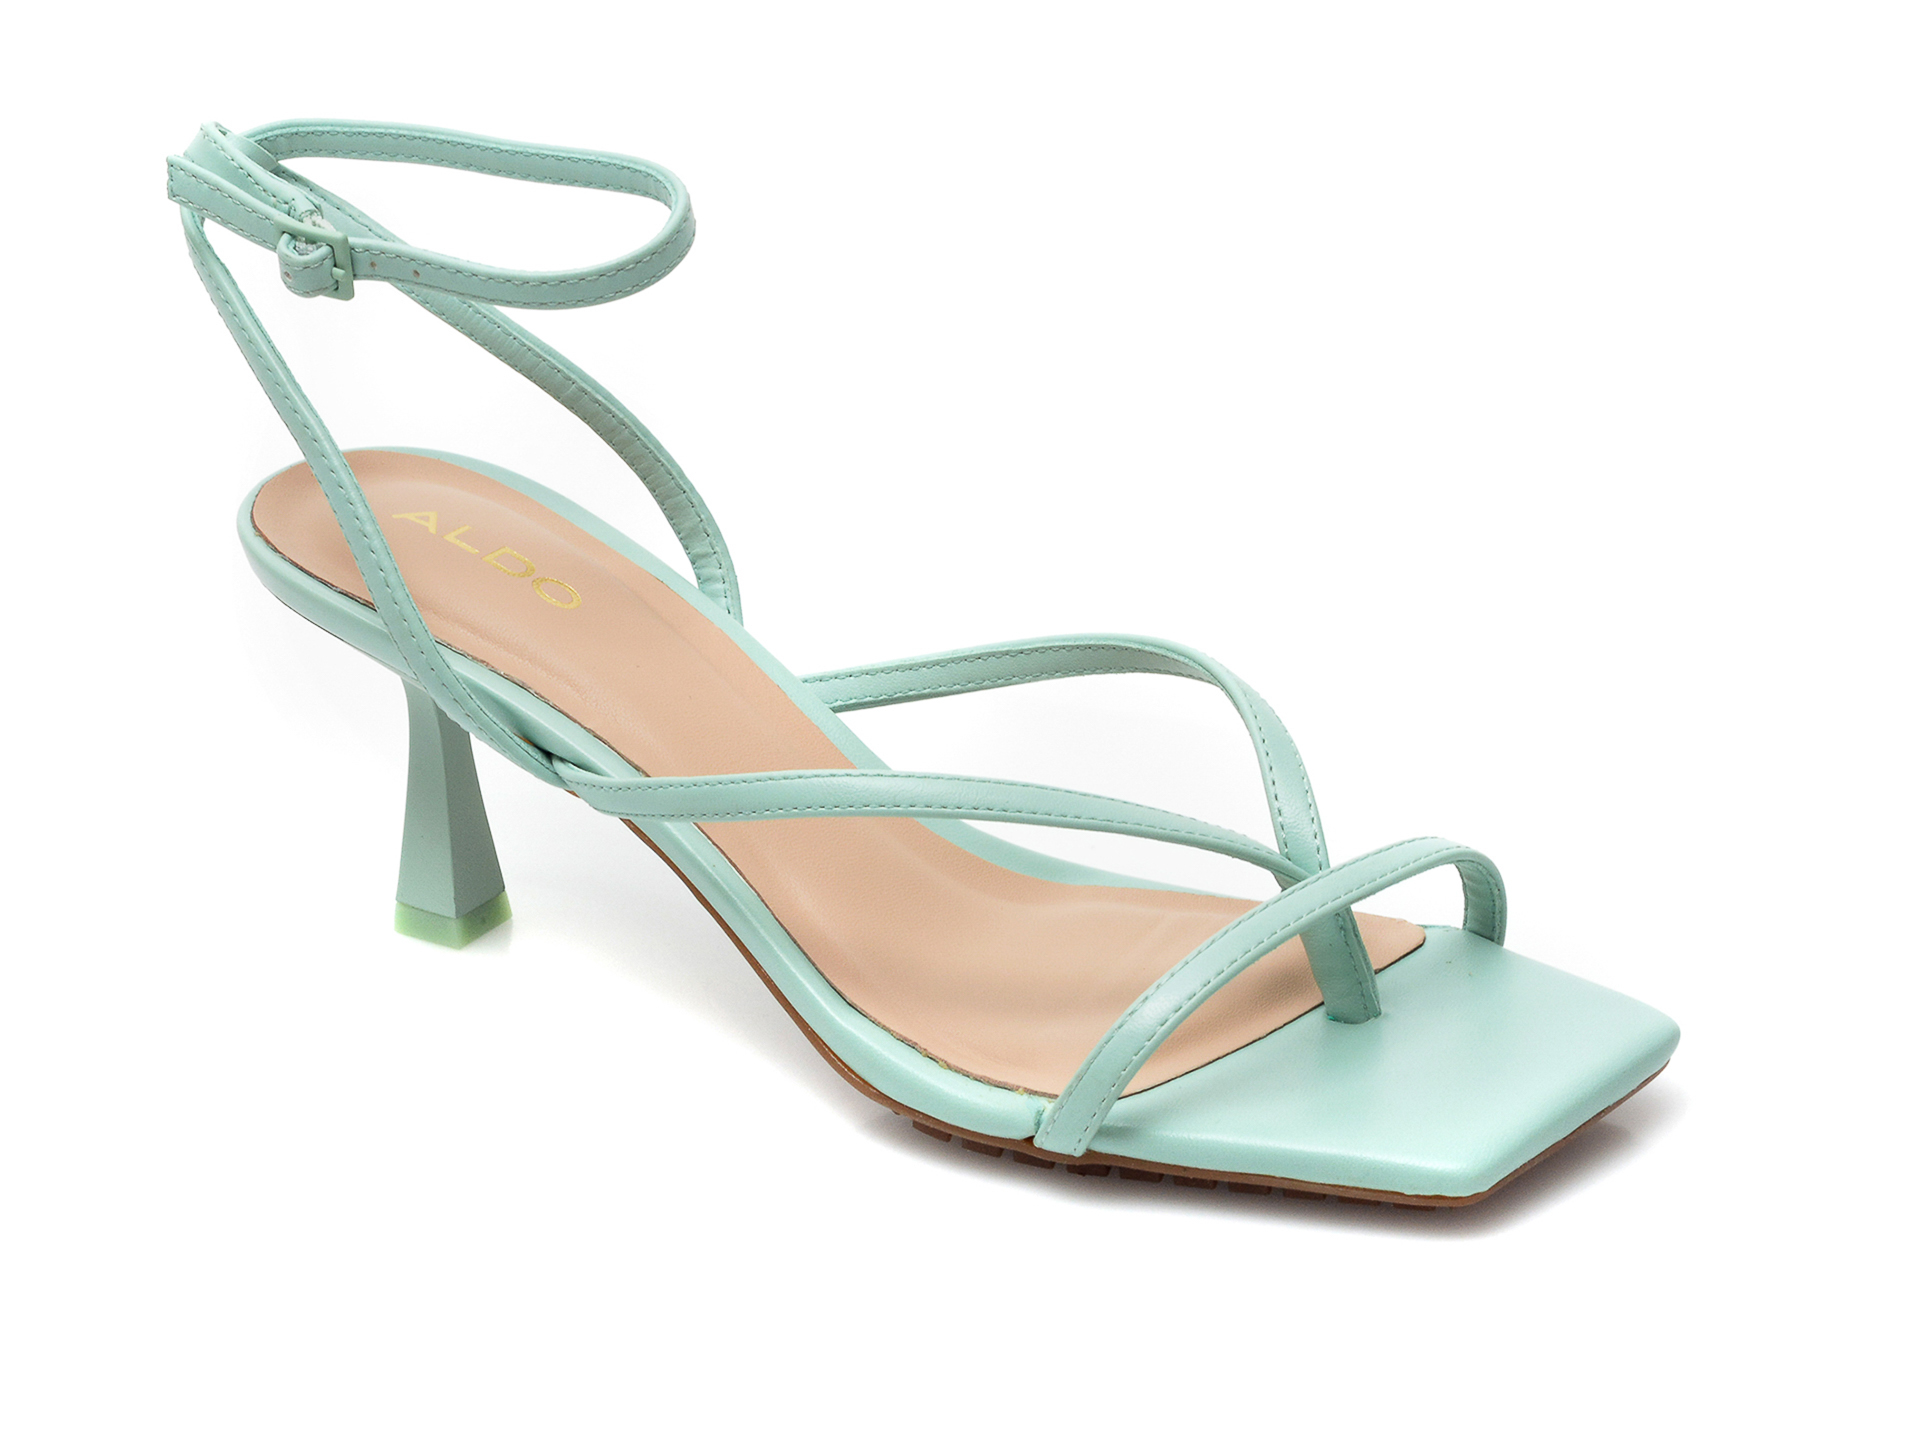 Sandale ALDO verzi, Kaviel330, din piele ecologica imagine otter.ro 2021